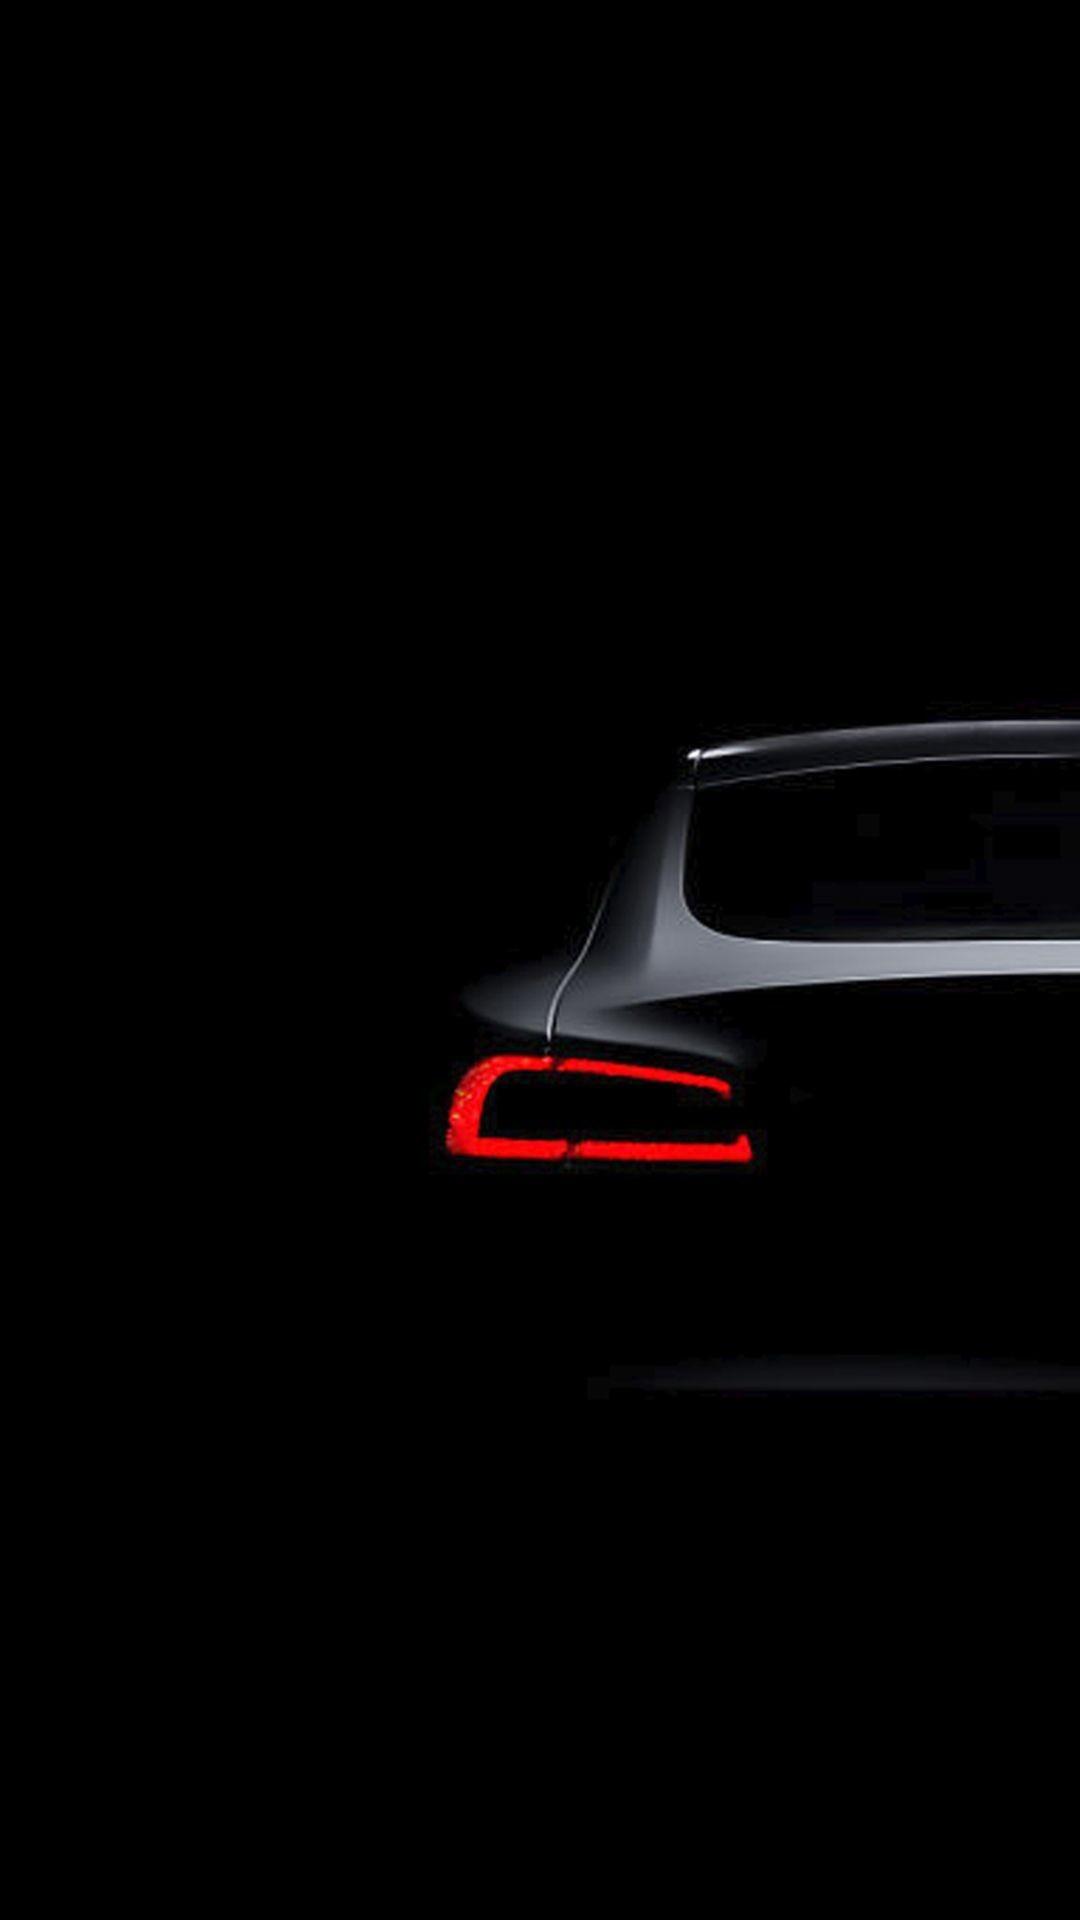 Res: 1080x1920, Tesla Model S Dark Brake Light iPhone 6+ HD Wallpaper